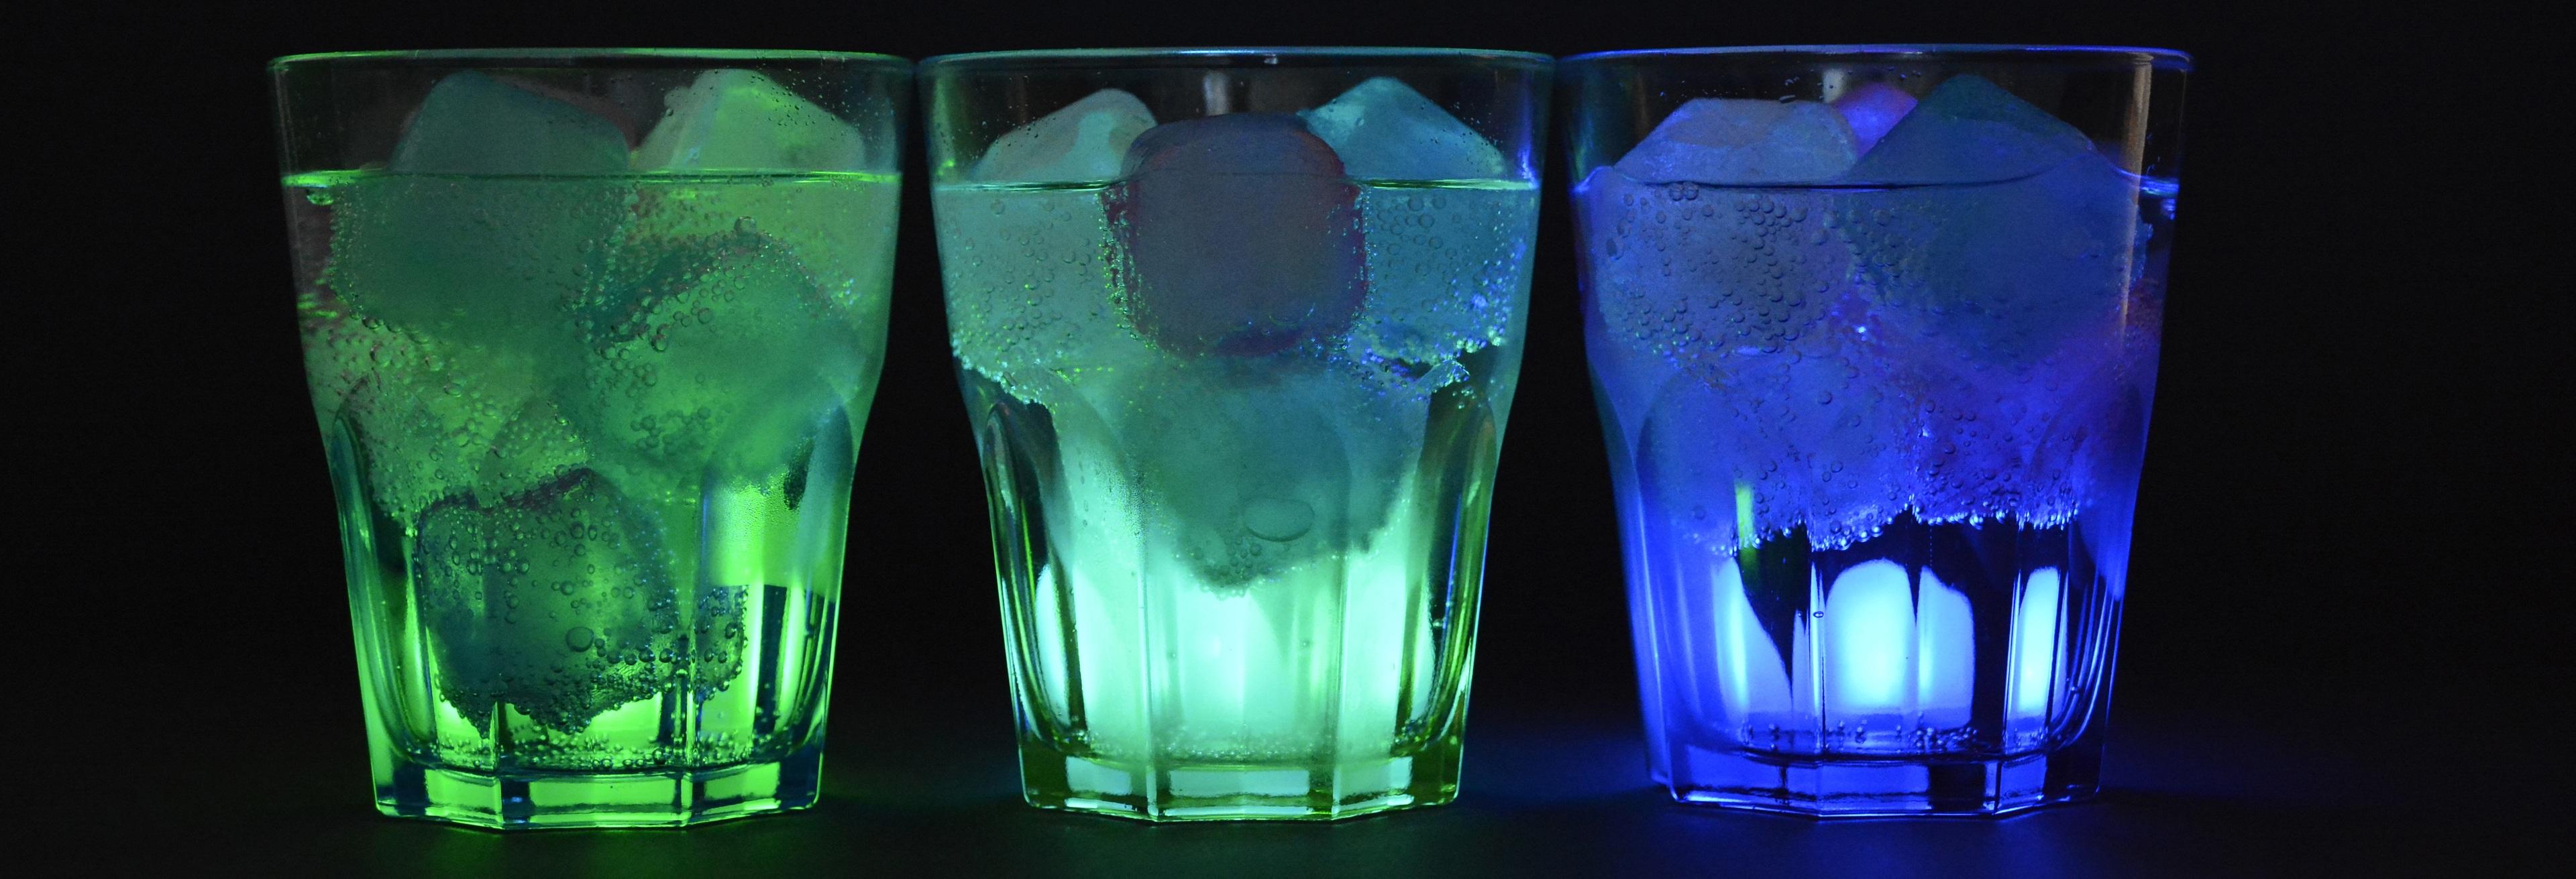 Alkoholhaltiga dejting alkoholfria